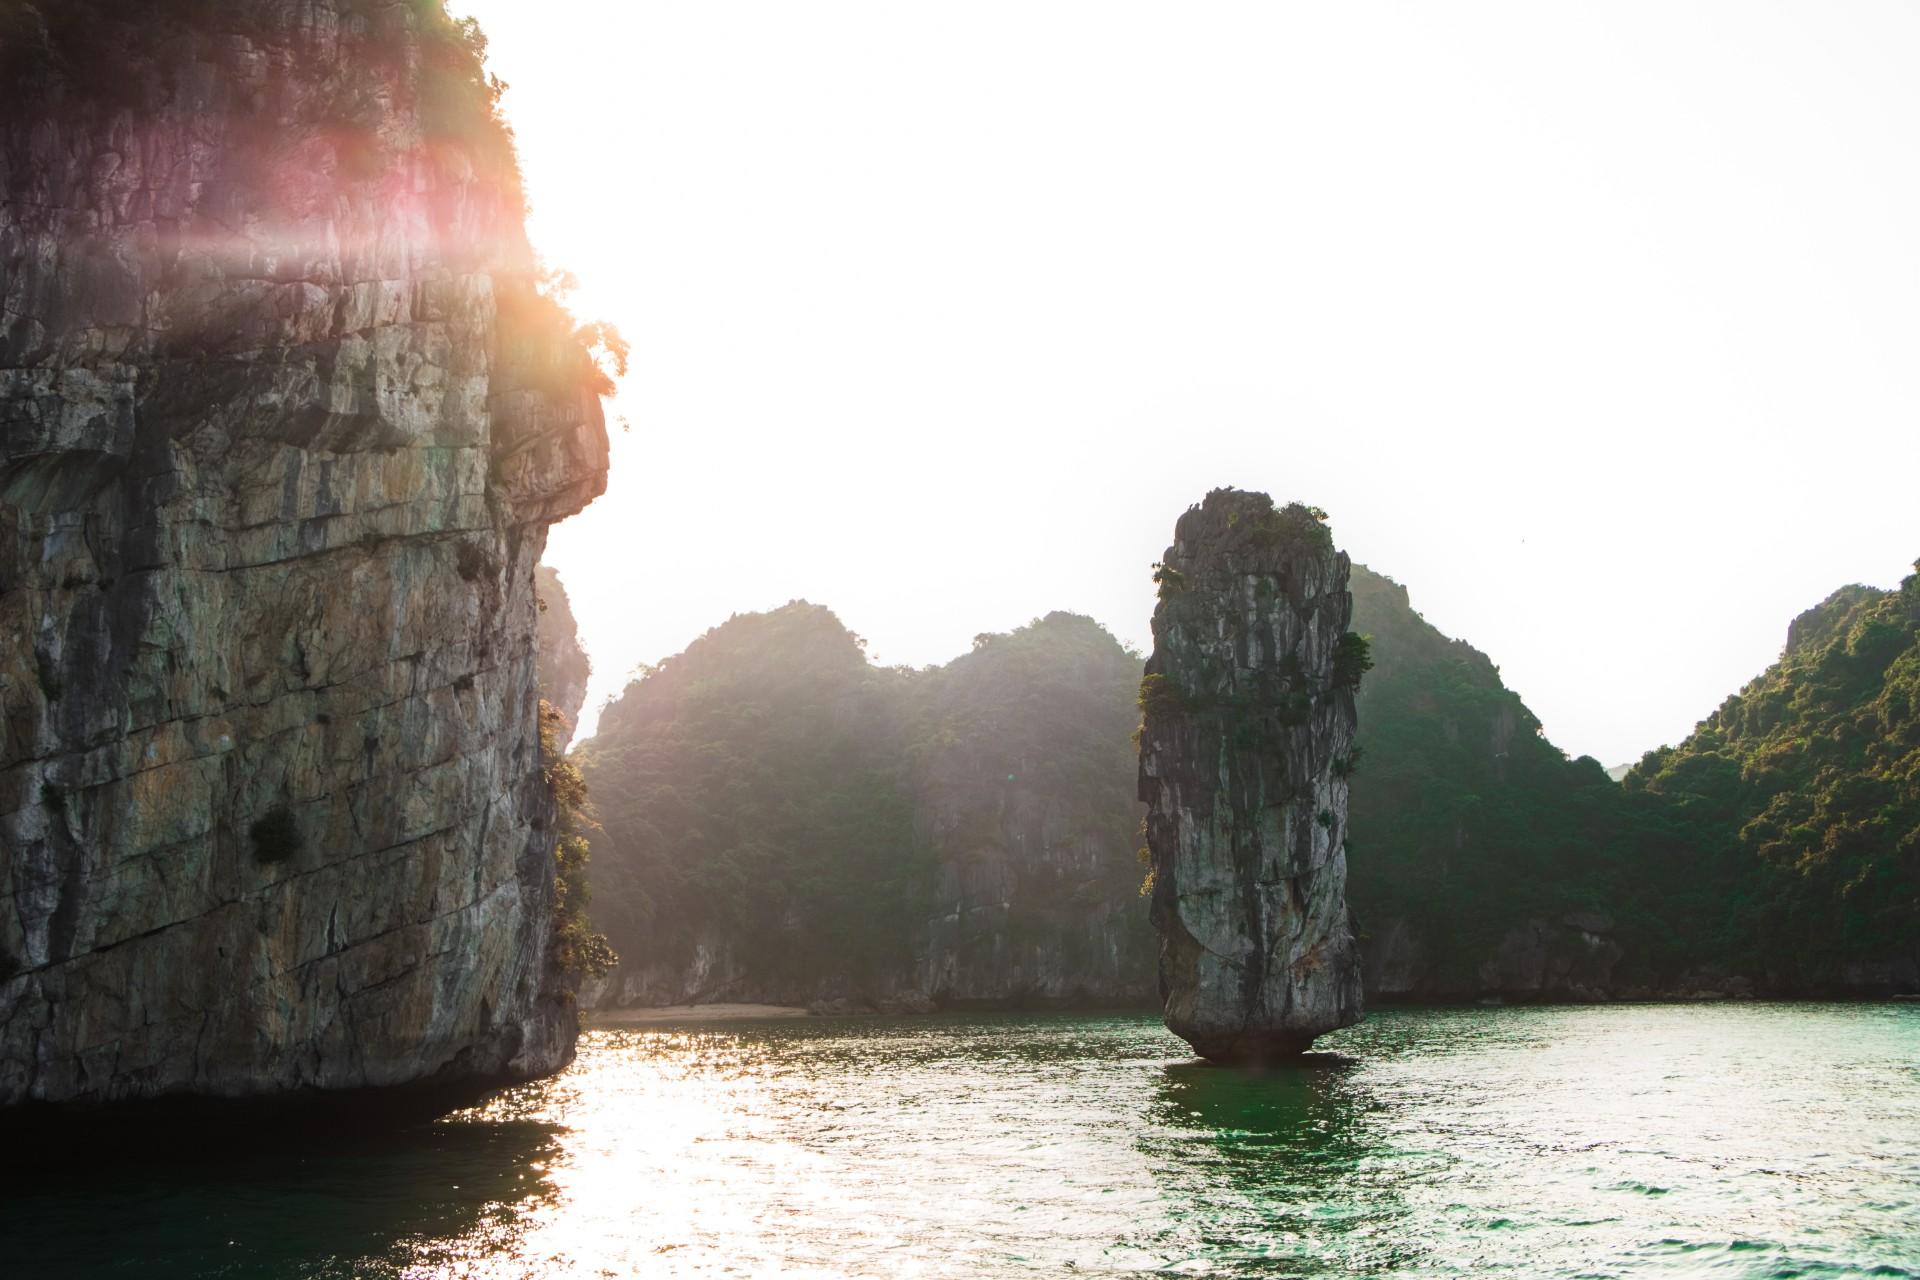 Ha Long Bay - Photo byJo JoonUnsplash